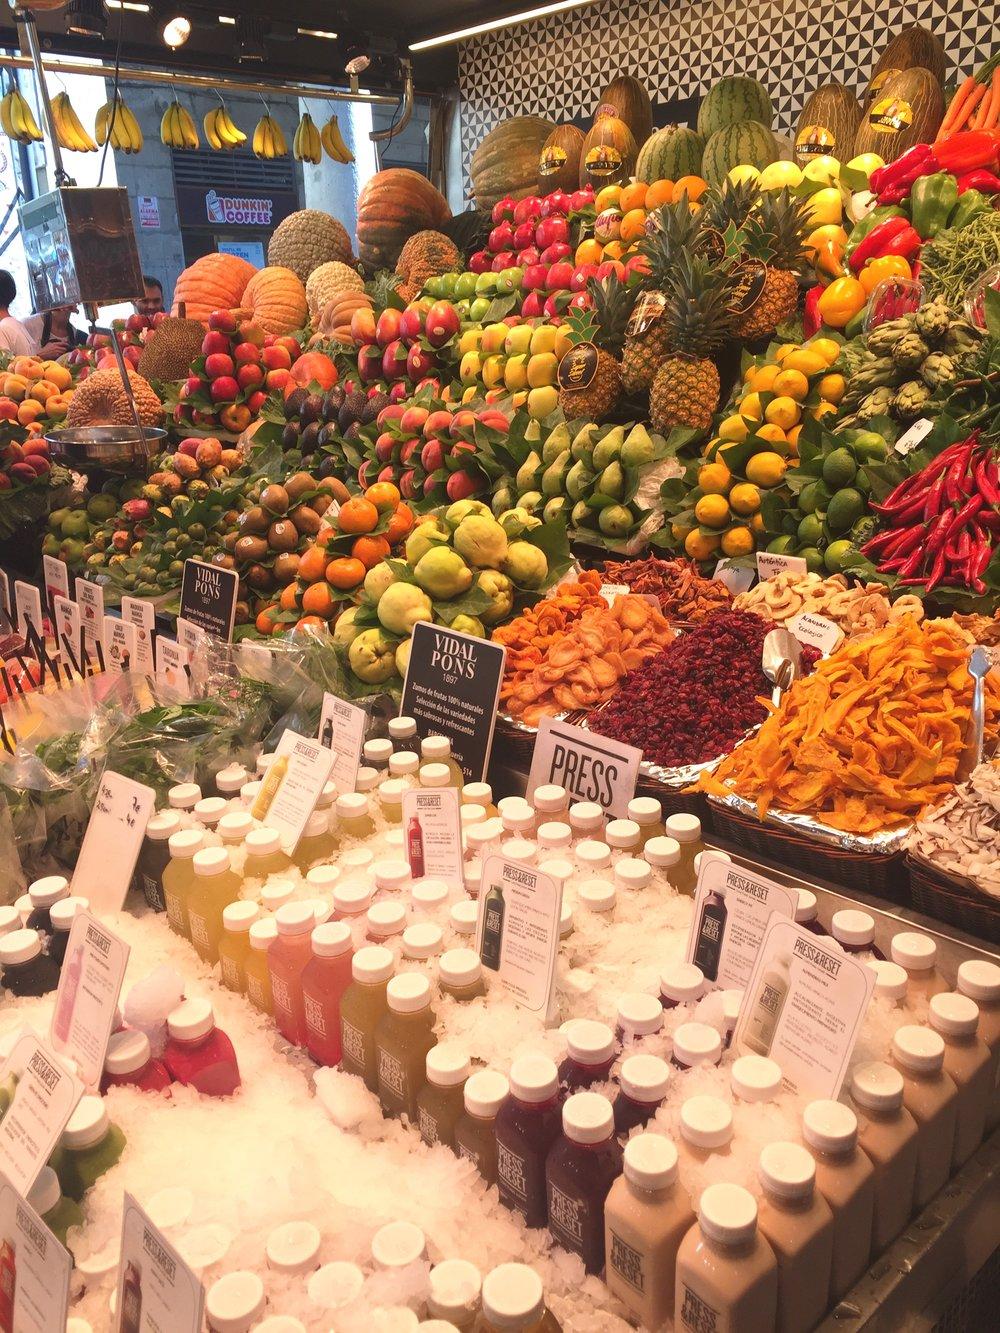 Hellloooooo fruit! Plentiful in Barcelona's Mercat de Sant Josep de la Boqueria